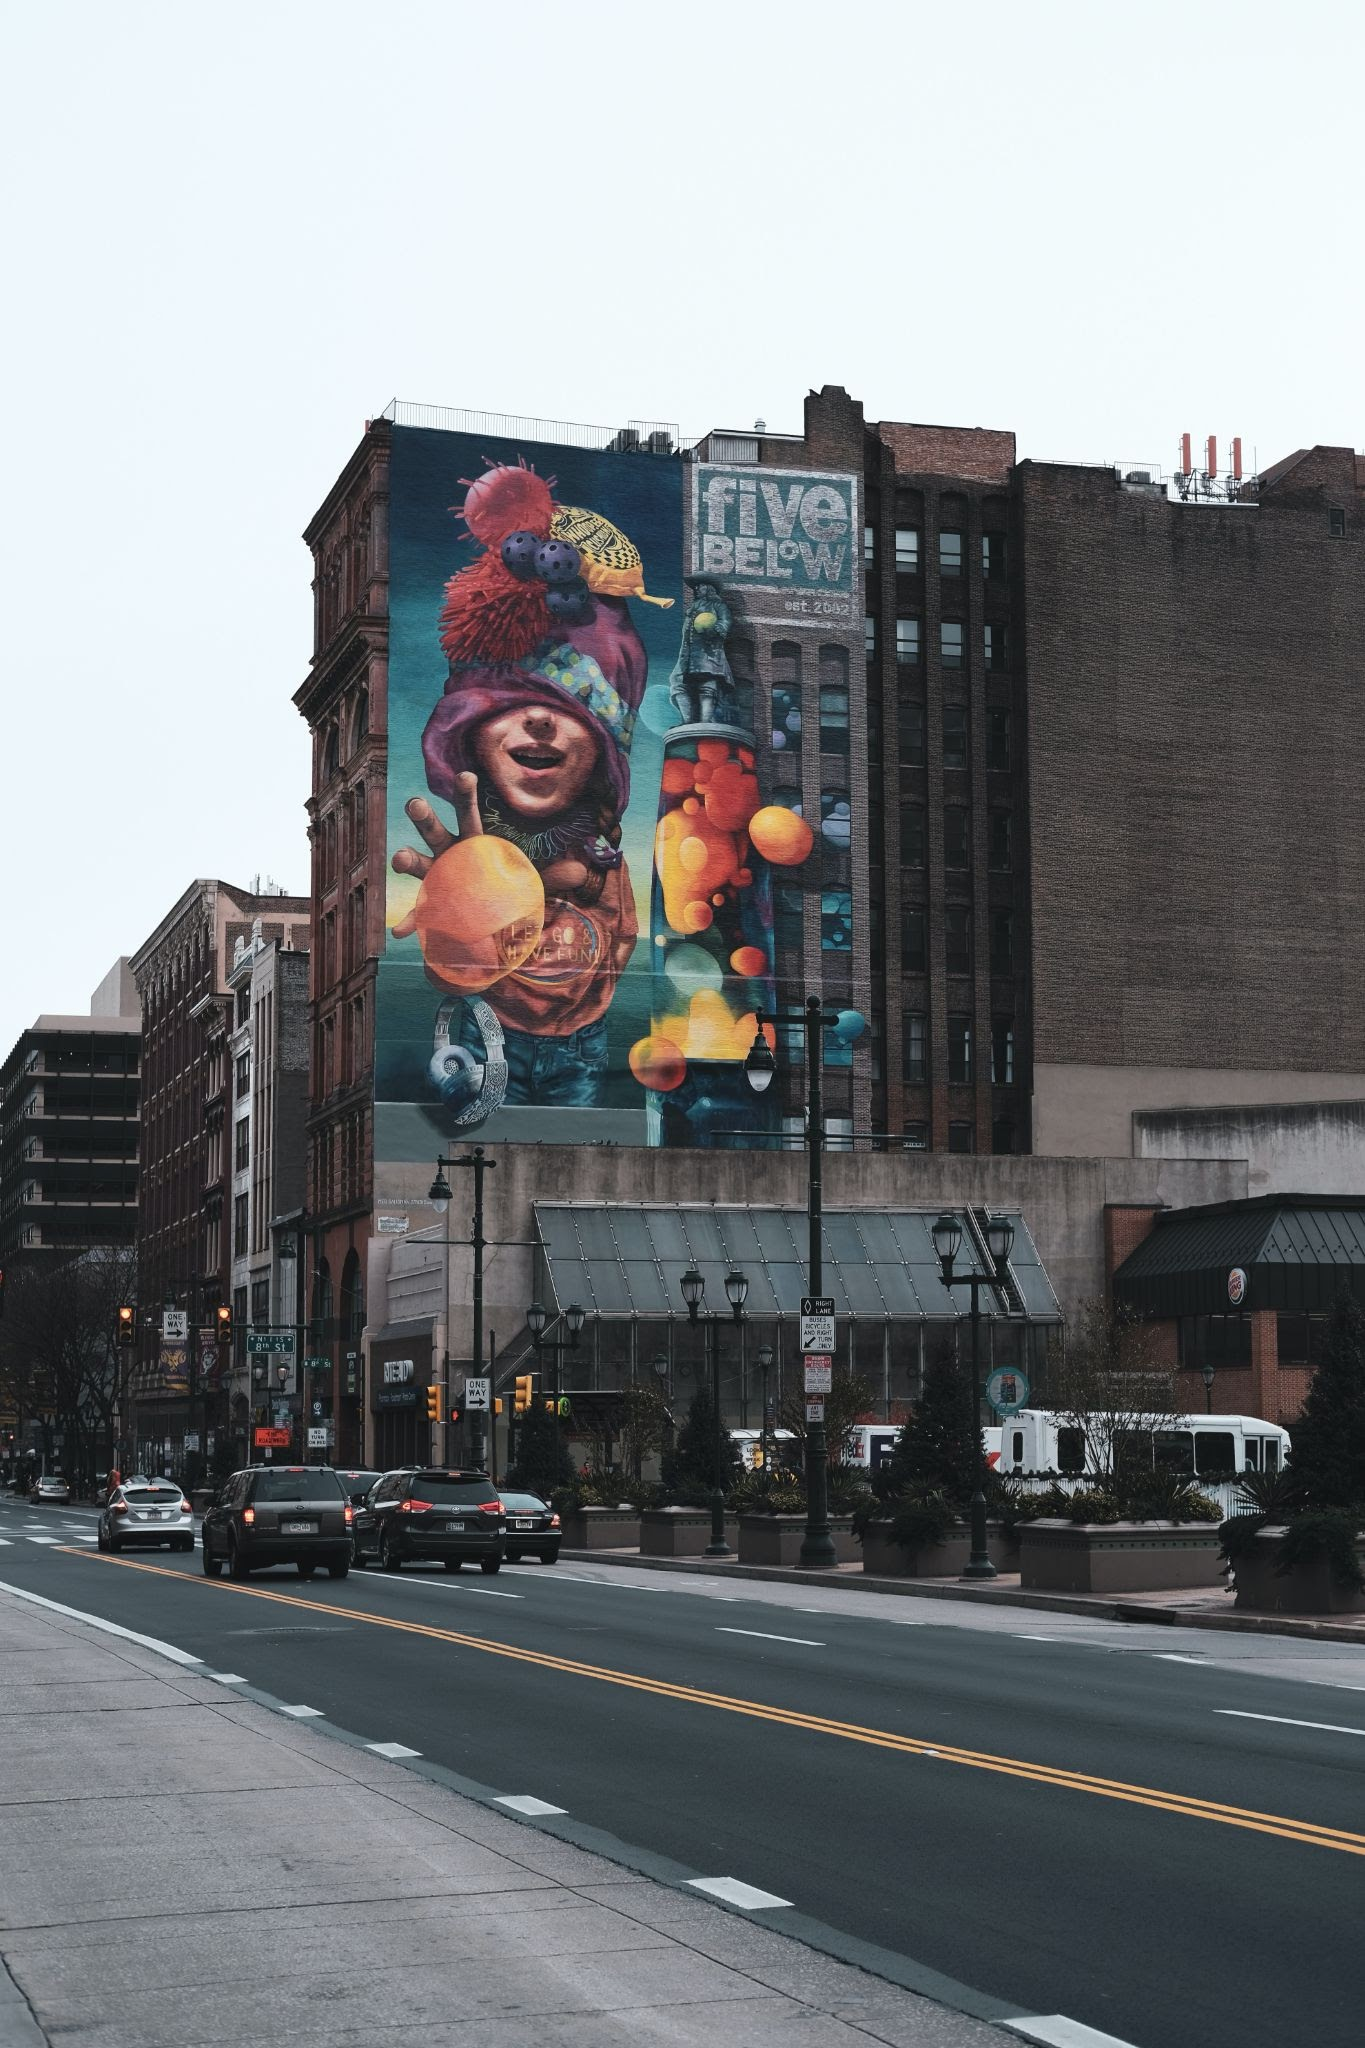 Five Below Mural by Meg Saligman